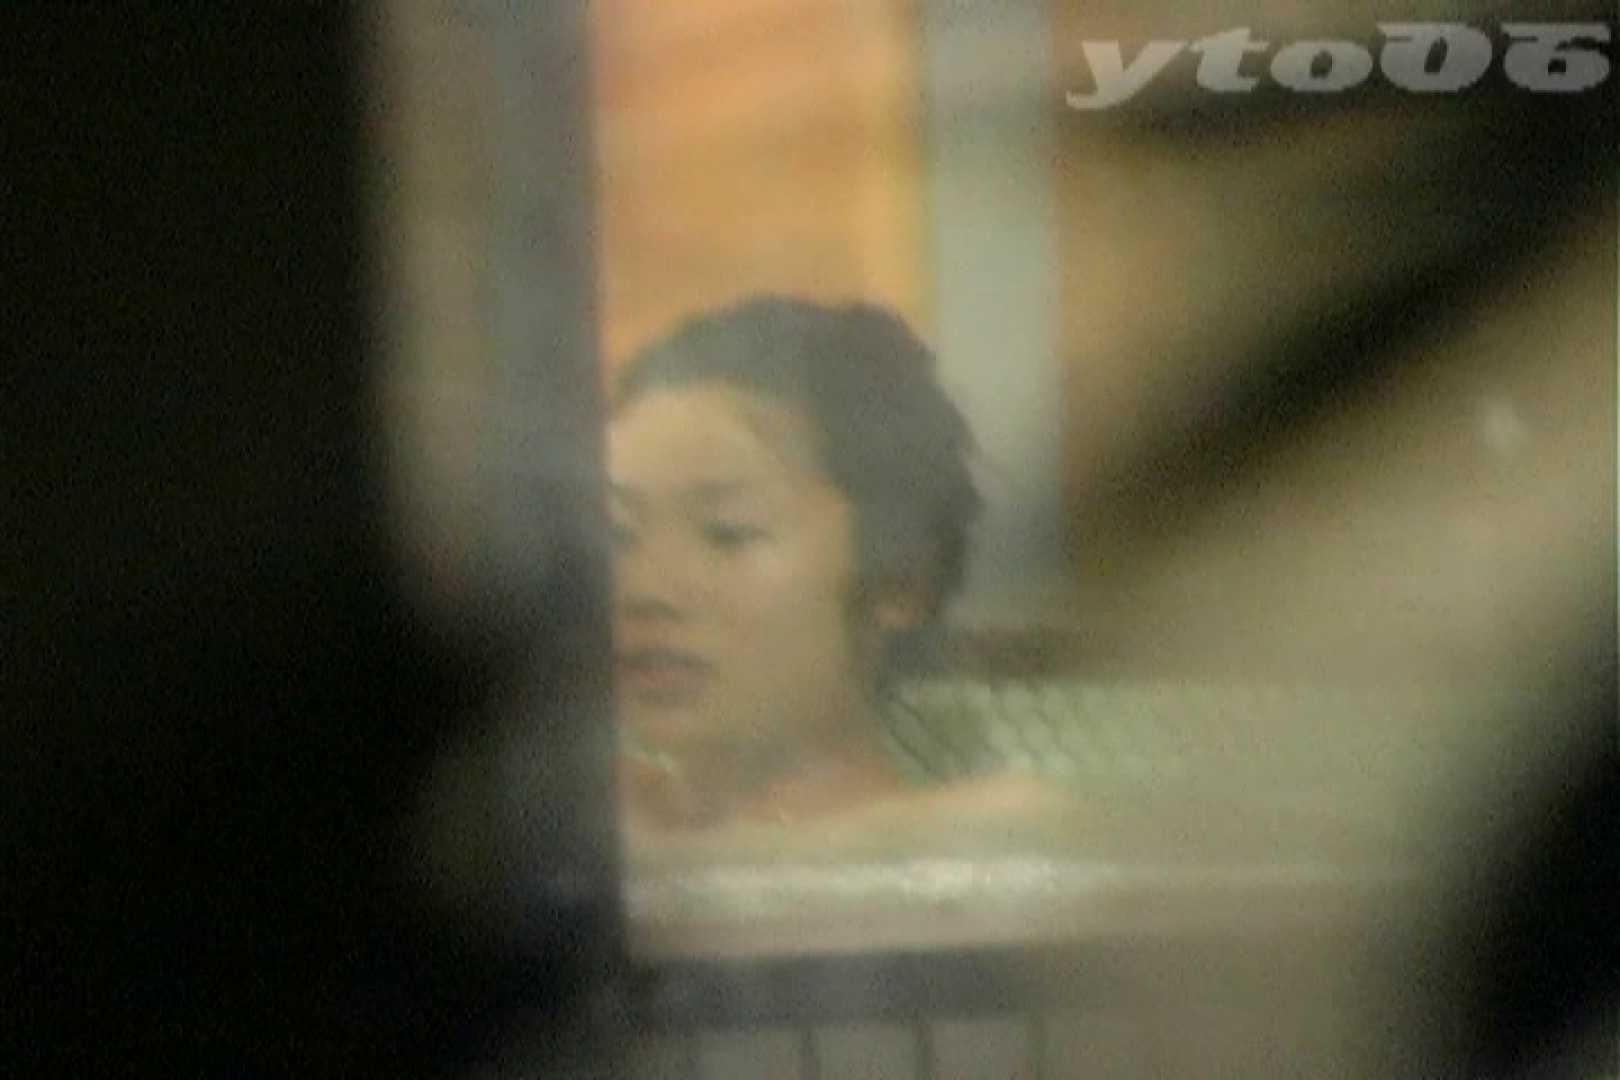 ▲復活限定▲合宿ホテル女風呂盗撮 Vol.36 盗撮 戯れ無修正画像 78PIX 14